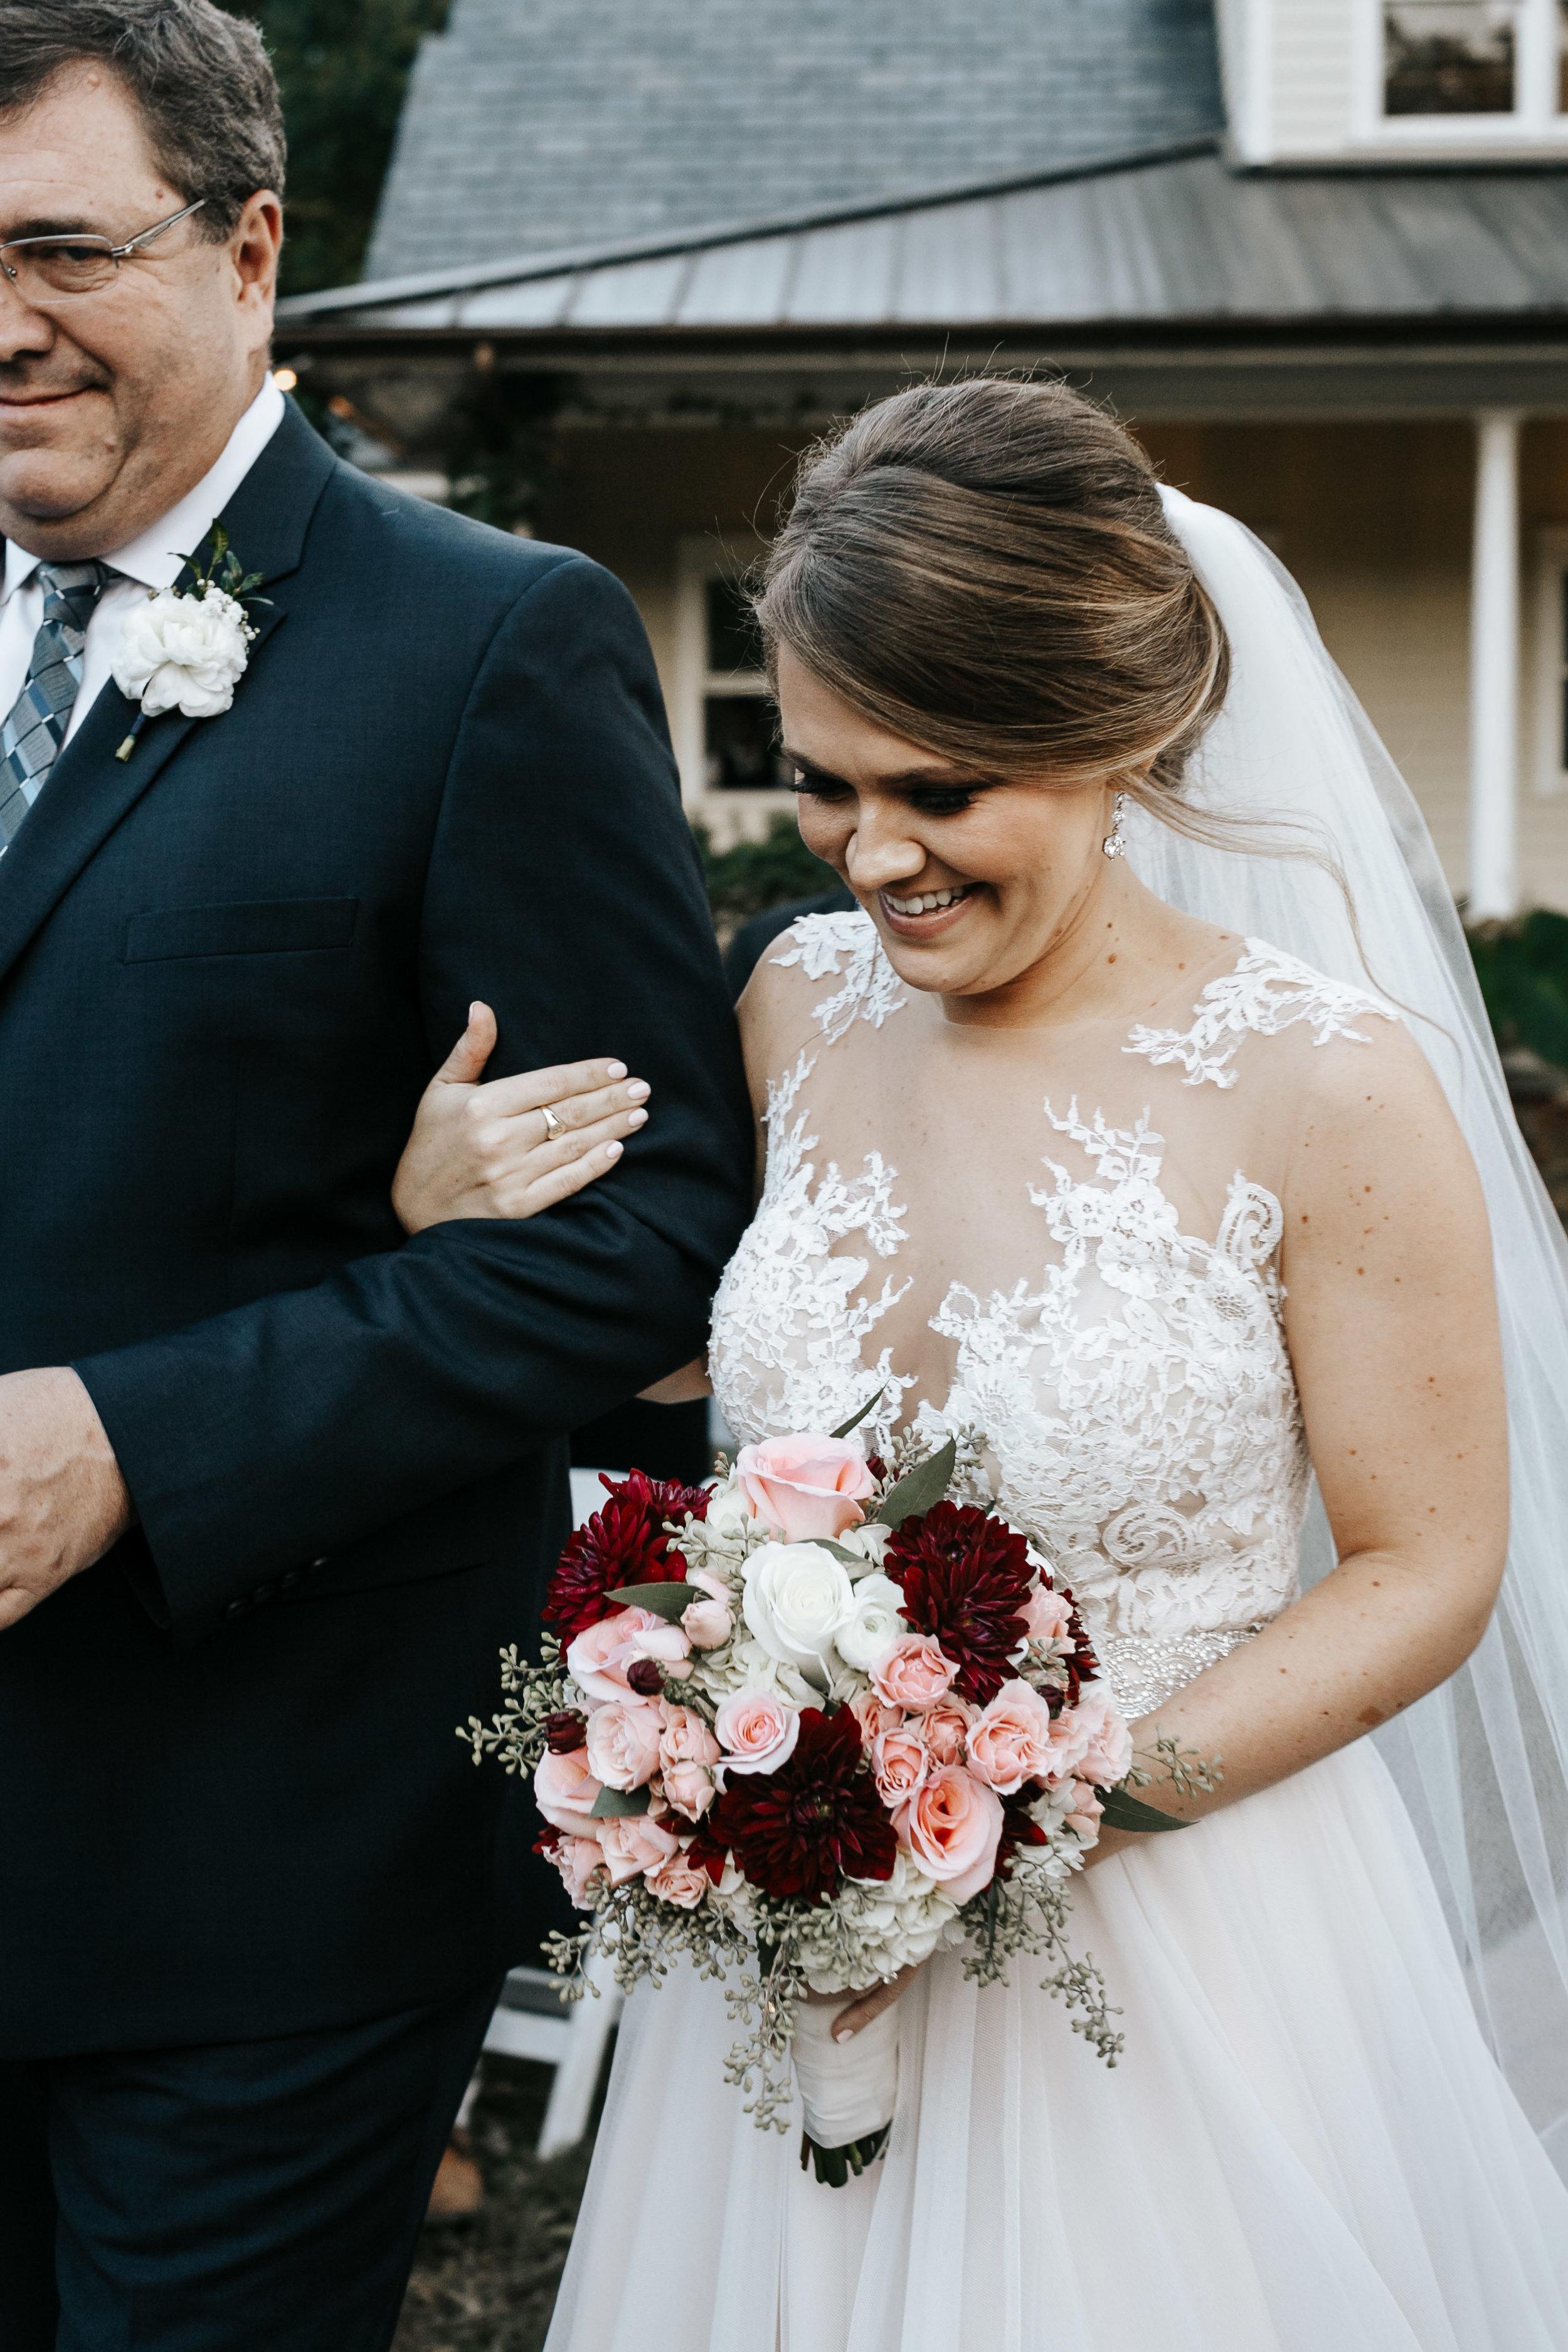 jessicabrandonwedding-32.jpg